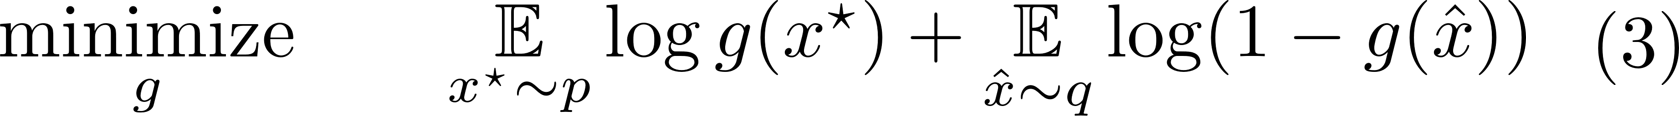 adversarial_constraint_eq3